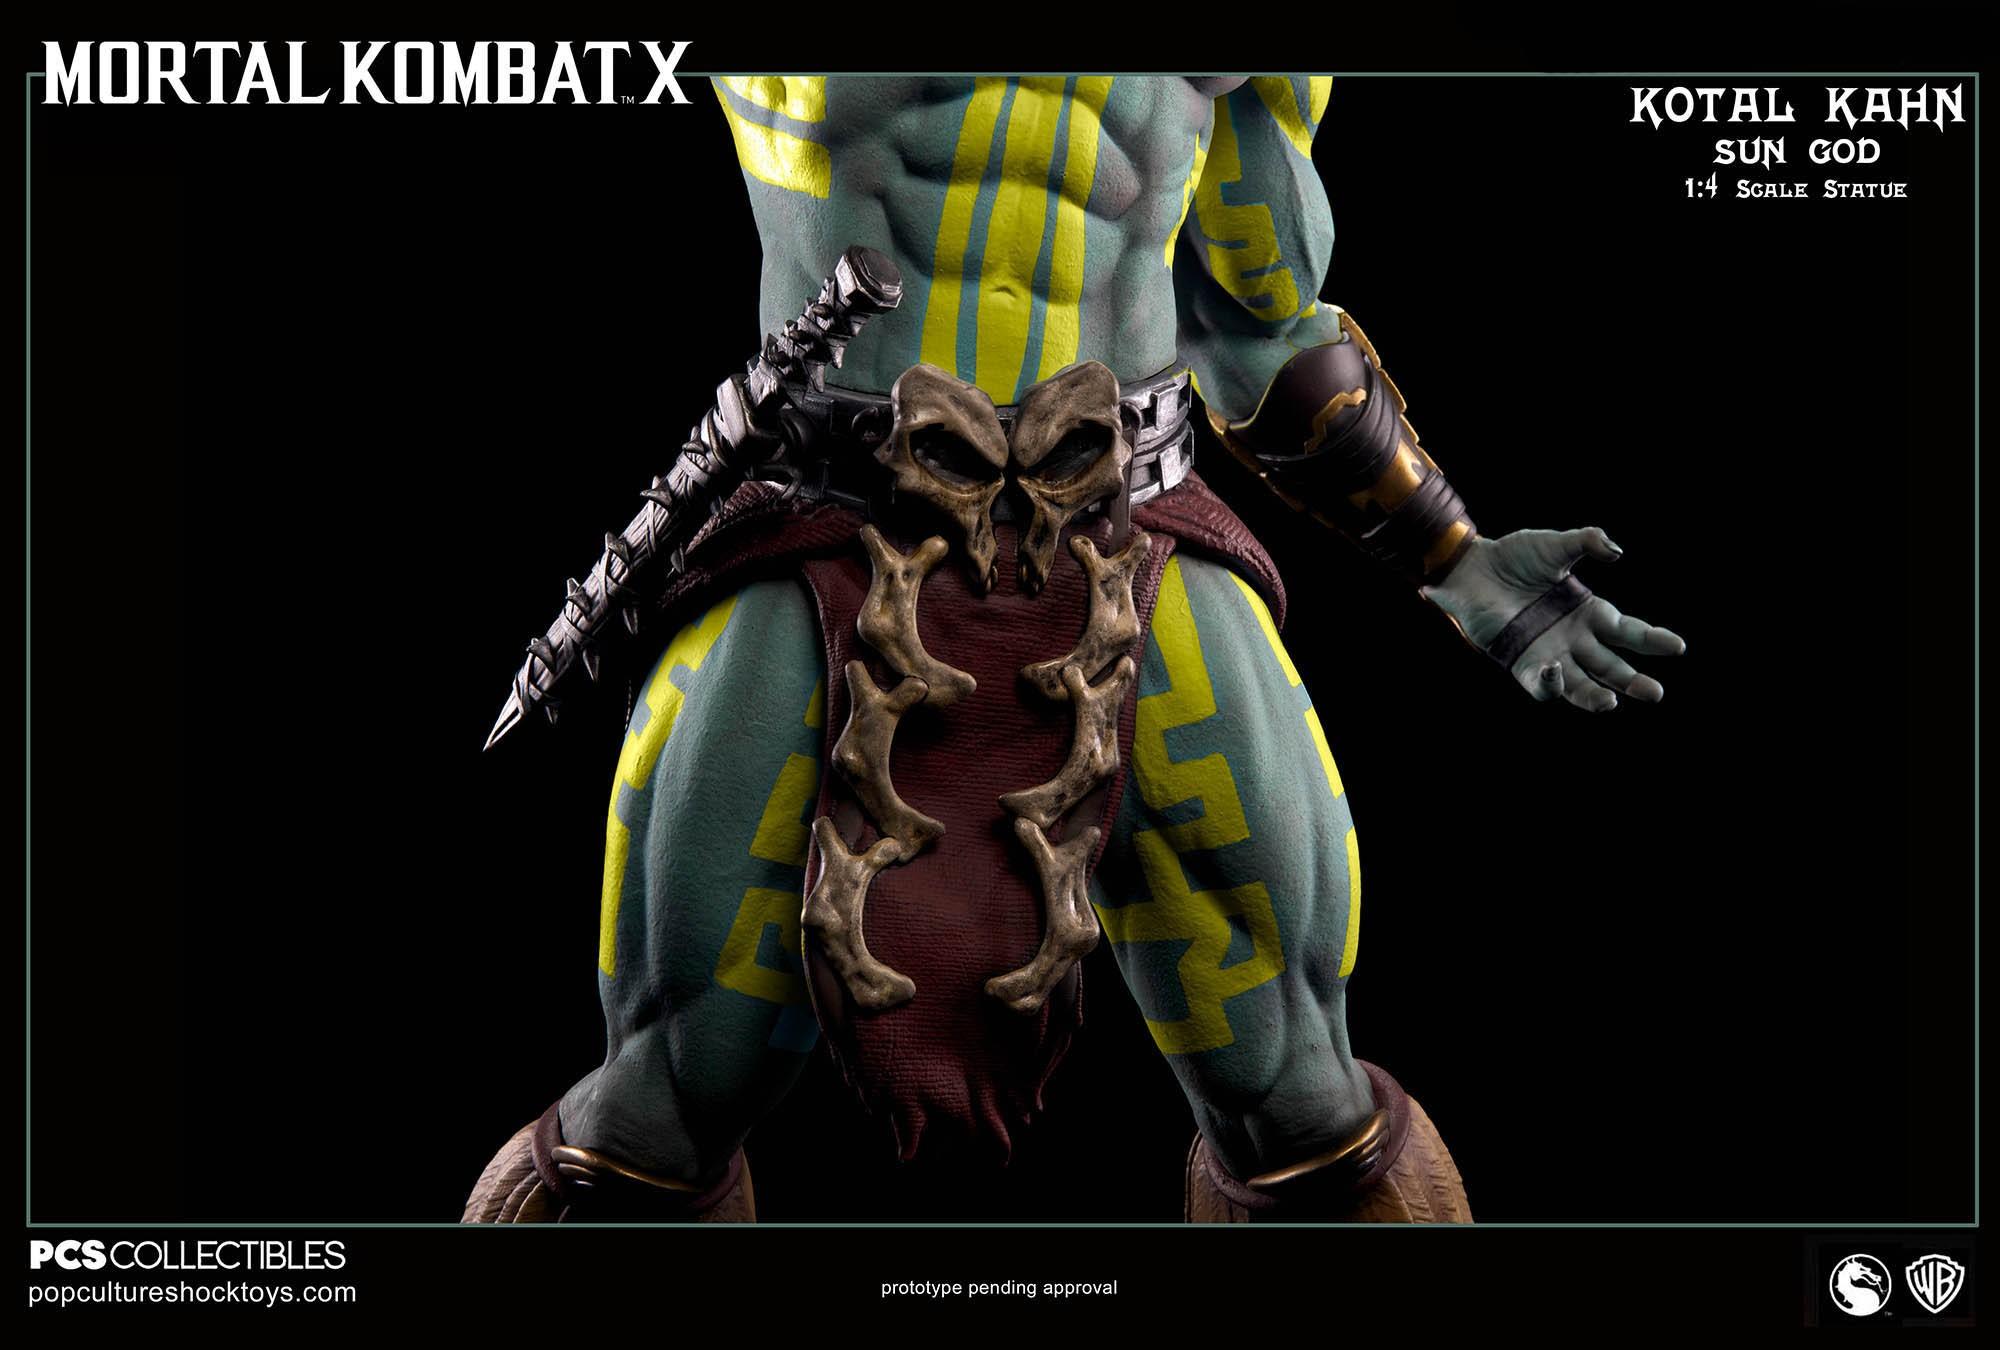 [Pop Culture Shock] Mortal Kombat X: Kotal Kahn 1:4 scale PCS-Kotal-Kahn-Sun-God-024